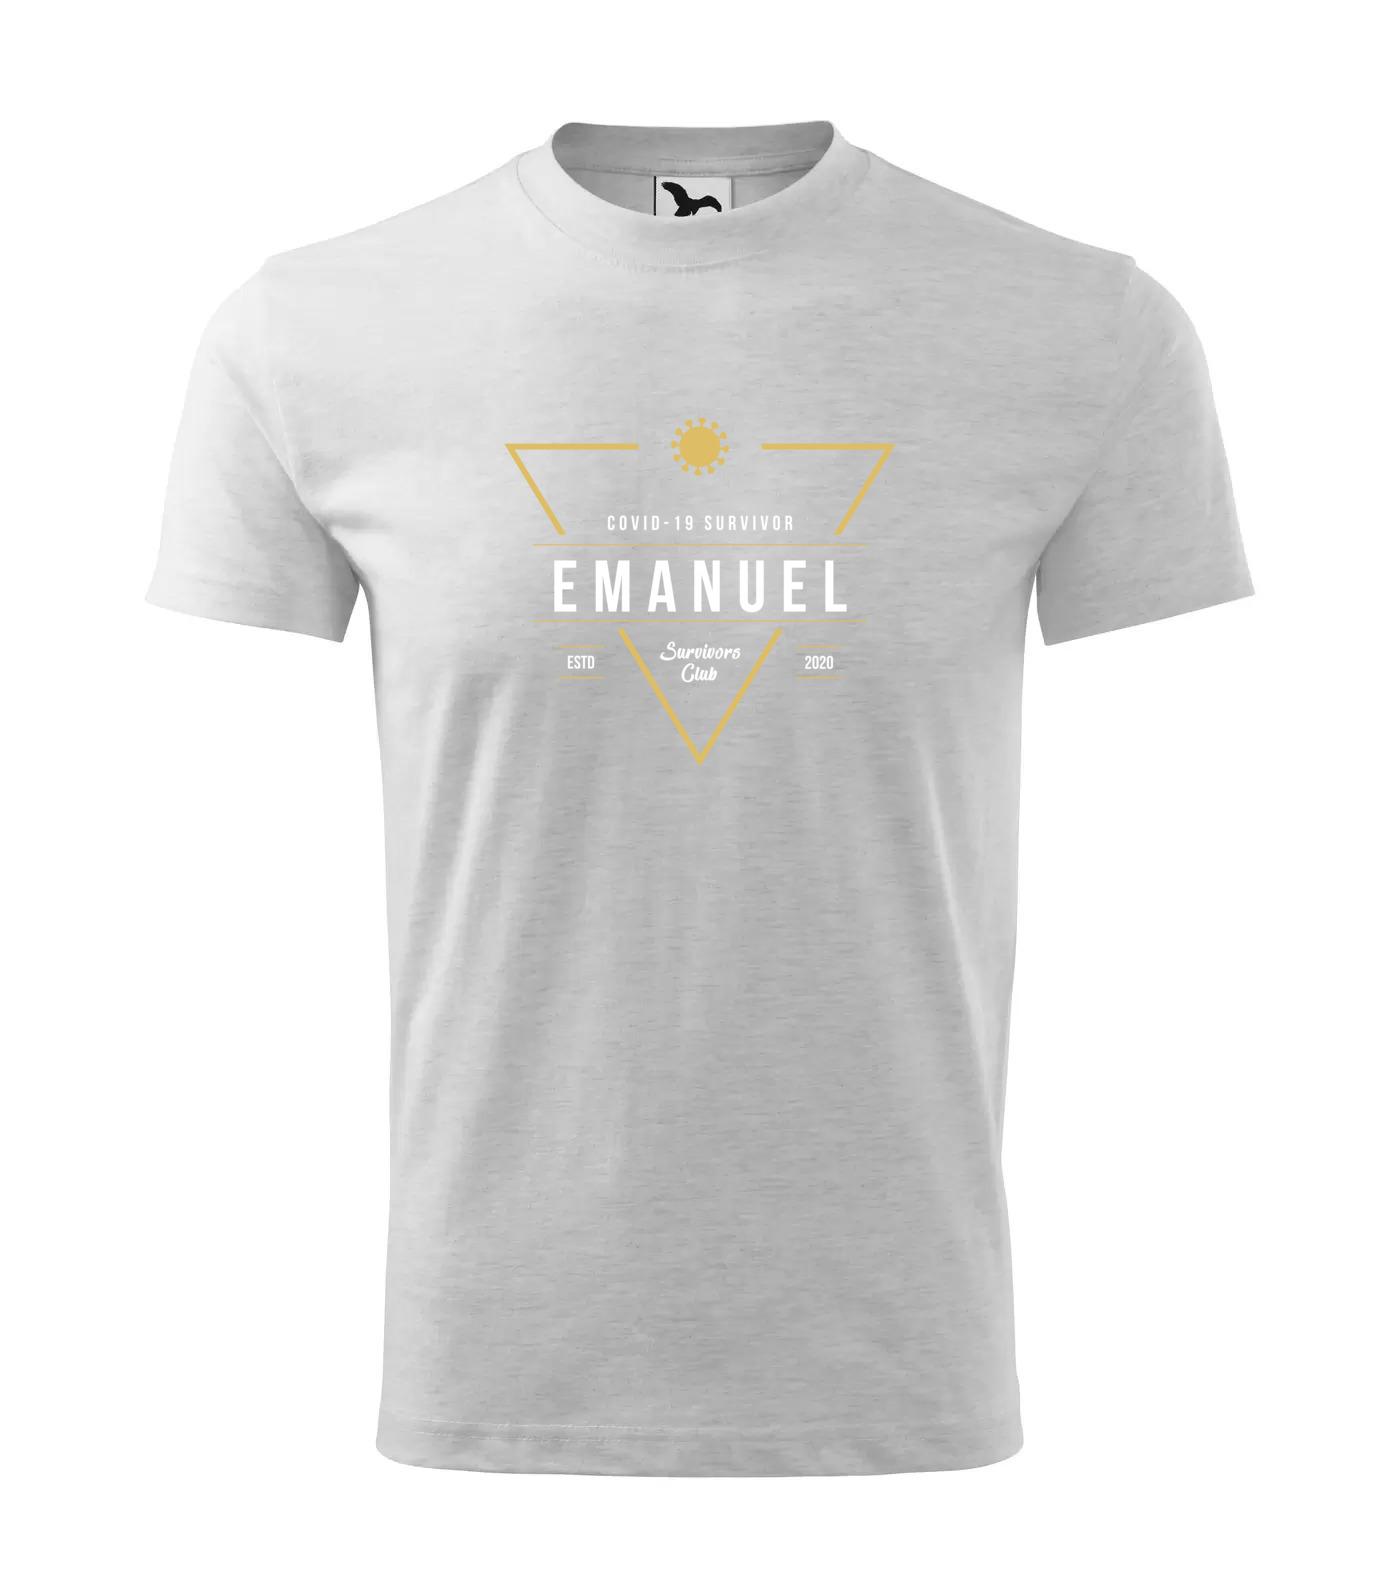 Tričko Survivor Club Emanuel